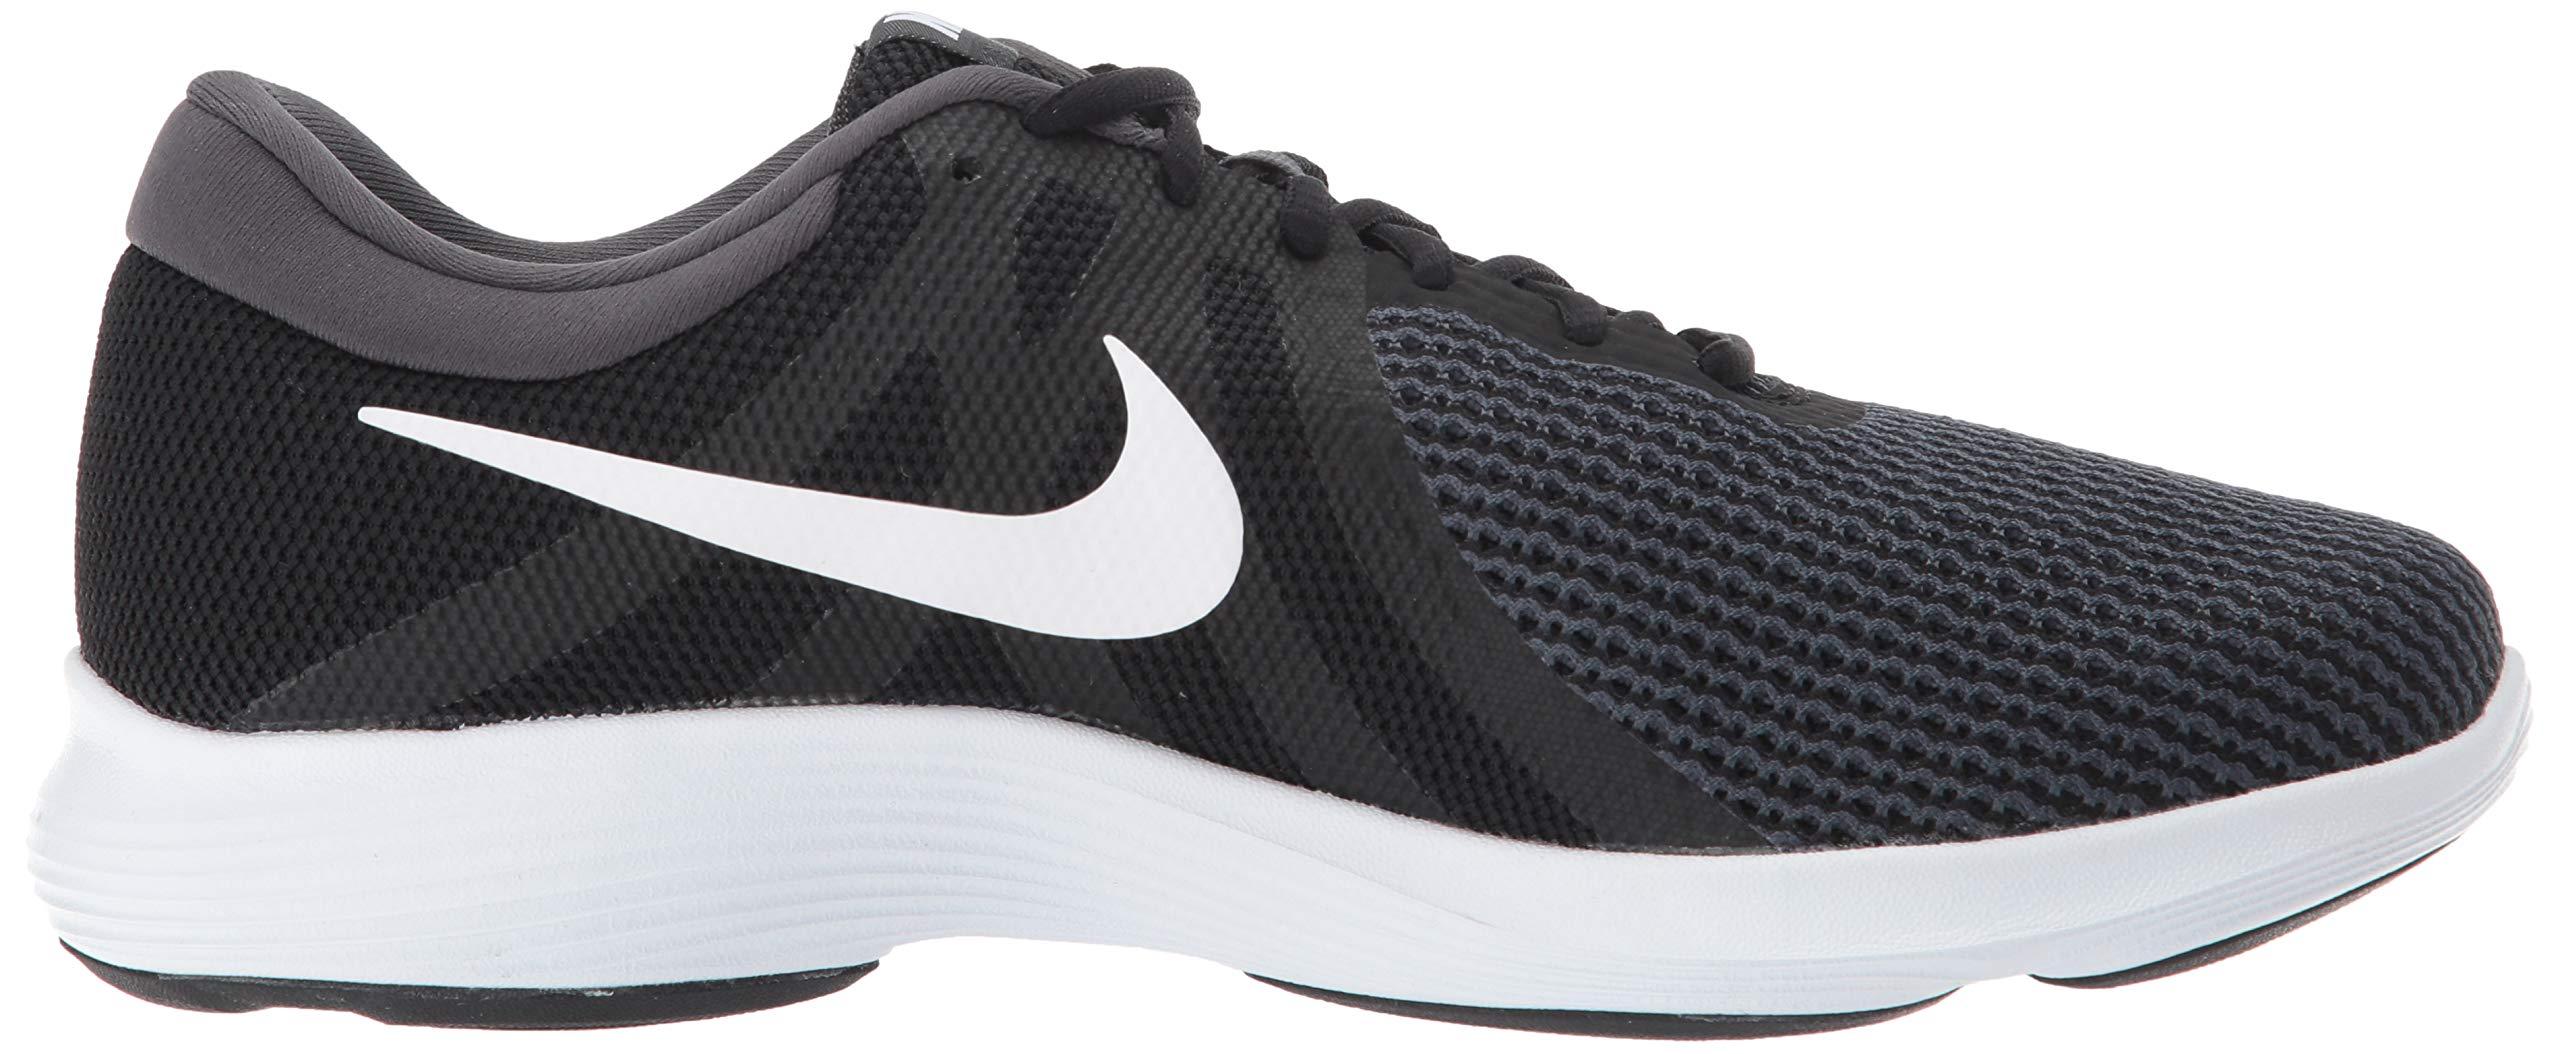 Nike Men's Revolution 4 Running Shoe Black/White - Anthracite 6.5 Wide US by Nike (Image #7)